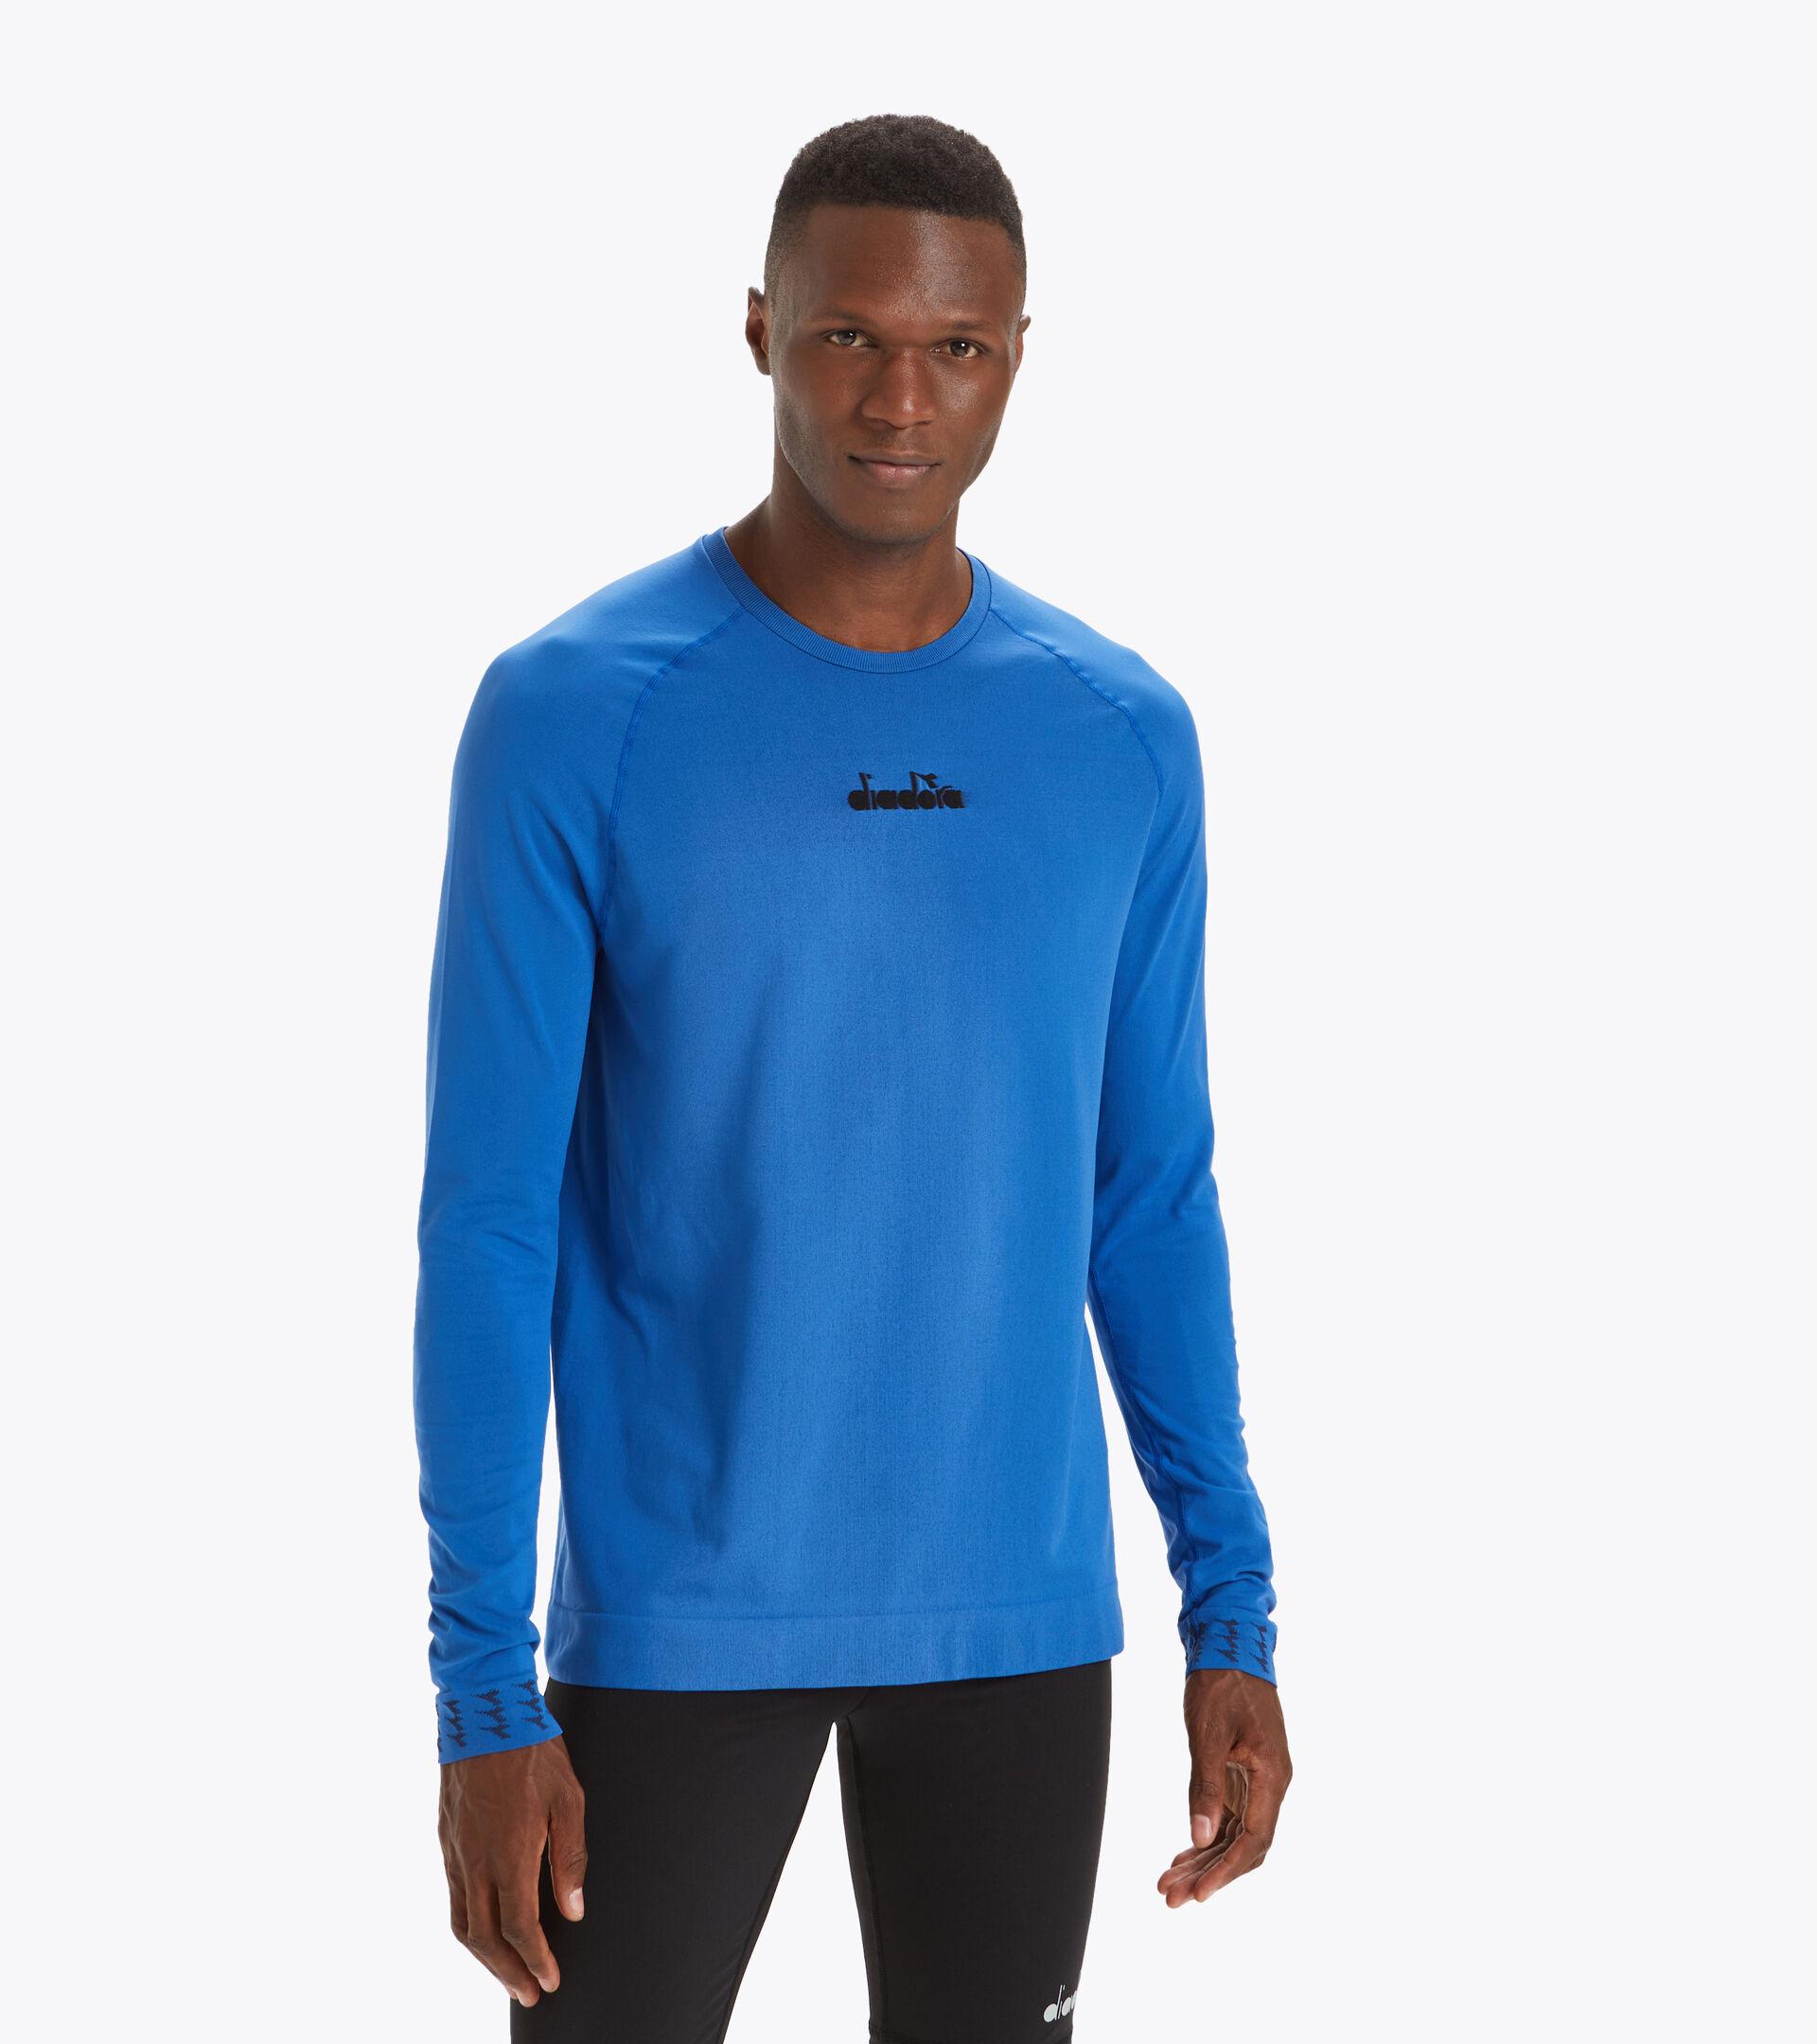 Apparel Sport UOMO LS SKIN FRIENDLY T-SHIRT FEDERAL BLUE Diadora